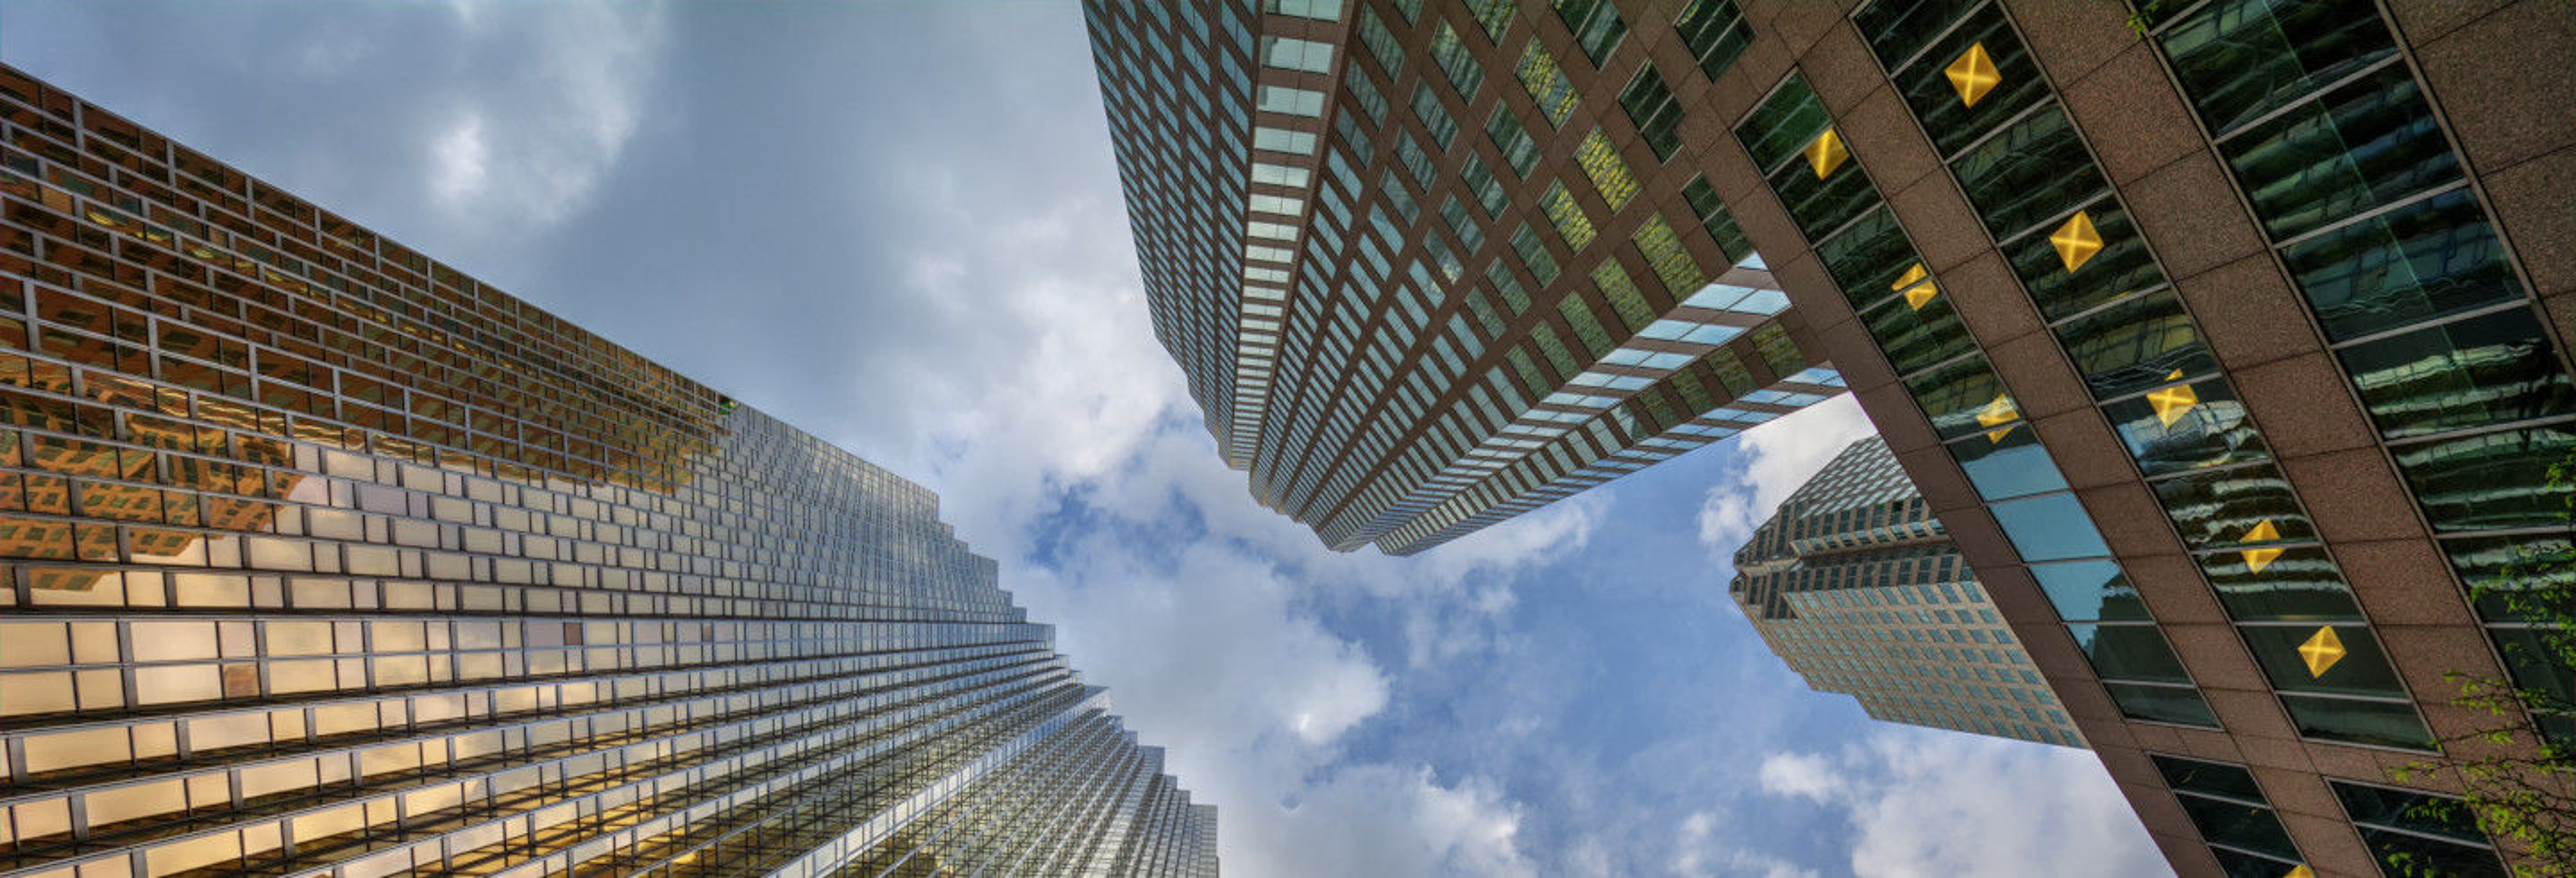 Tour privado de la arquitectura de Sao Paulo